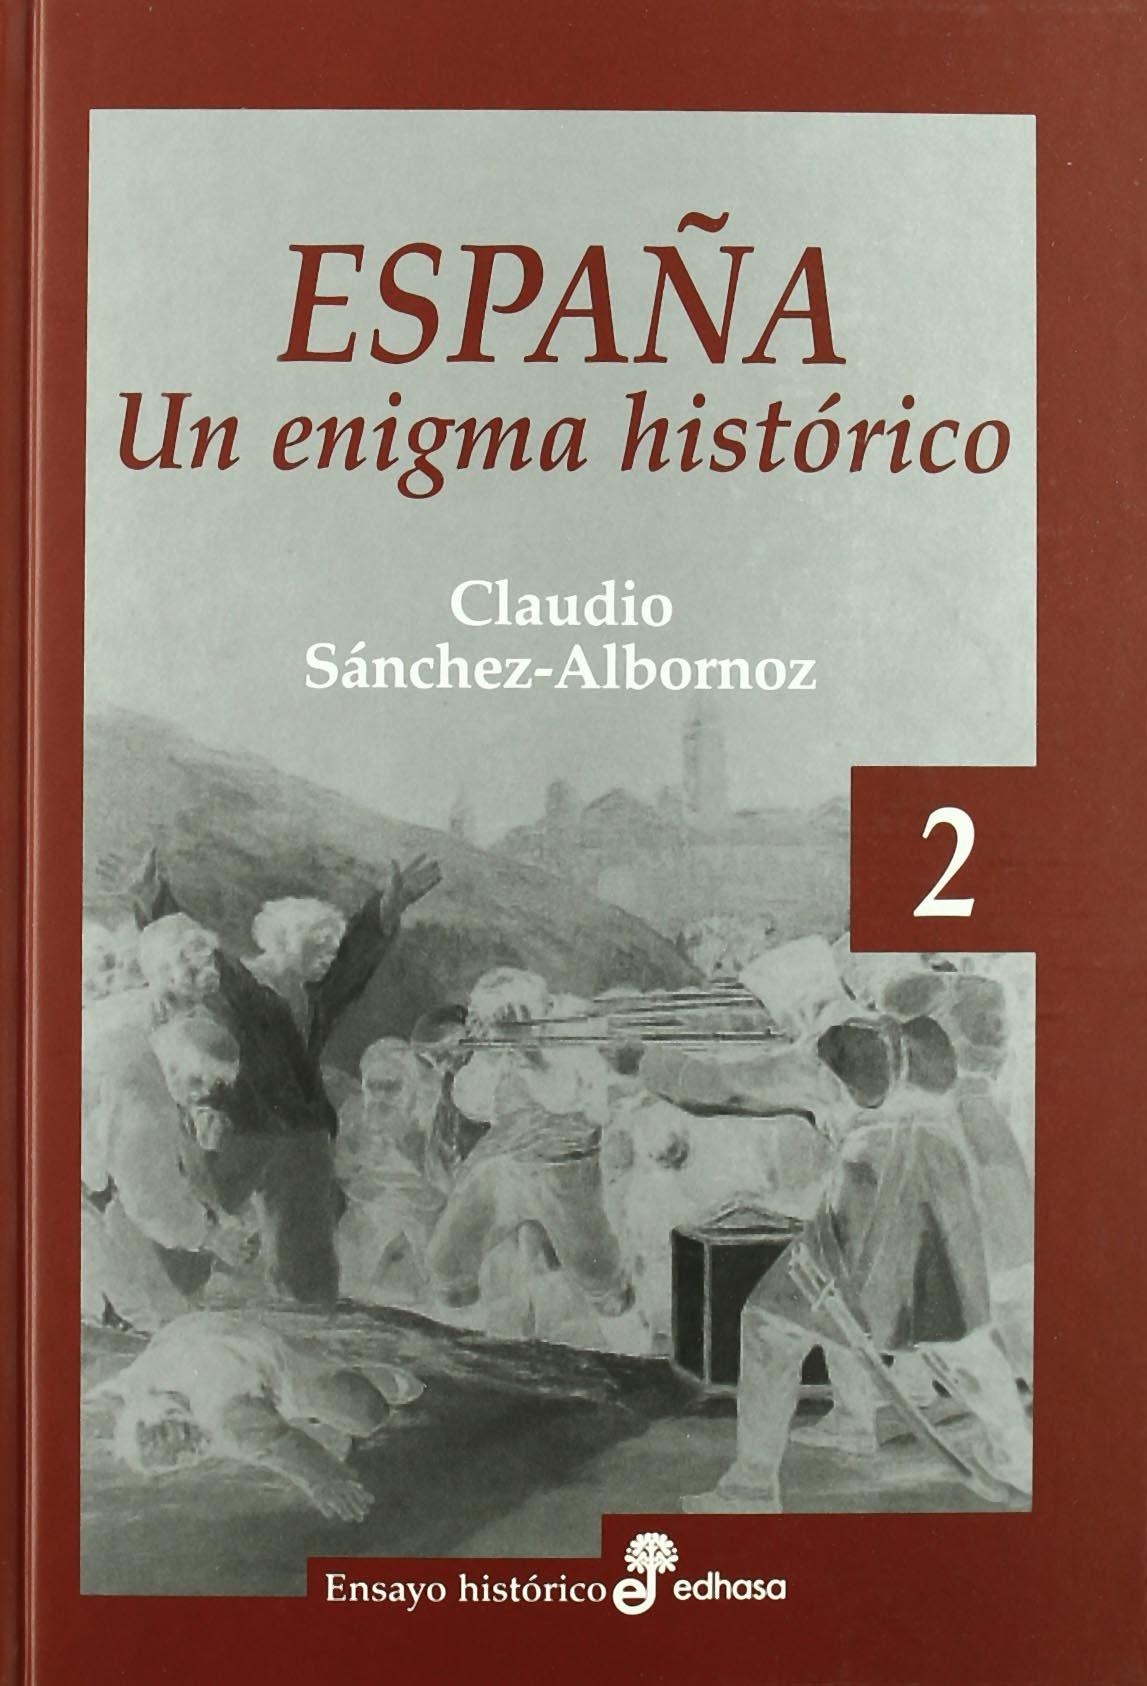 espana-enigma2.jpg